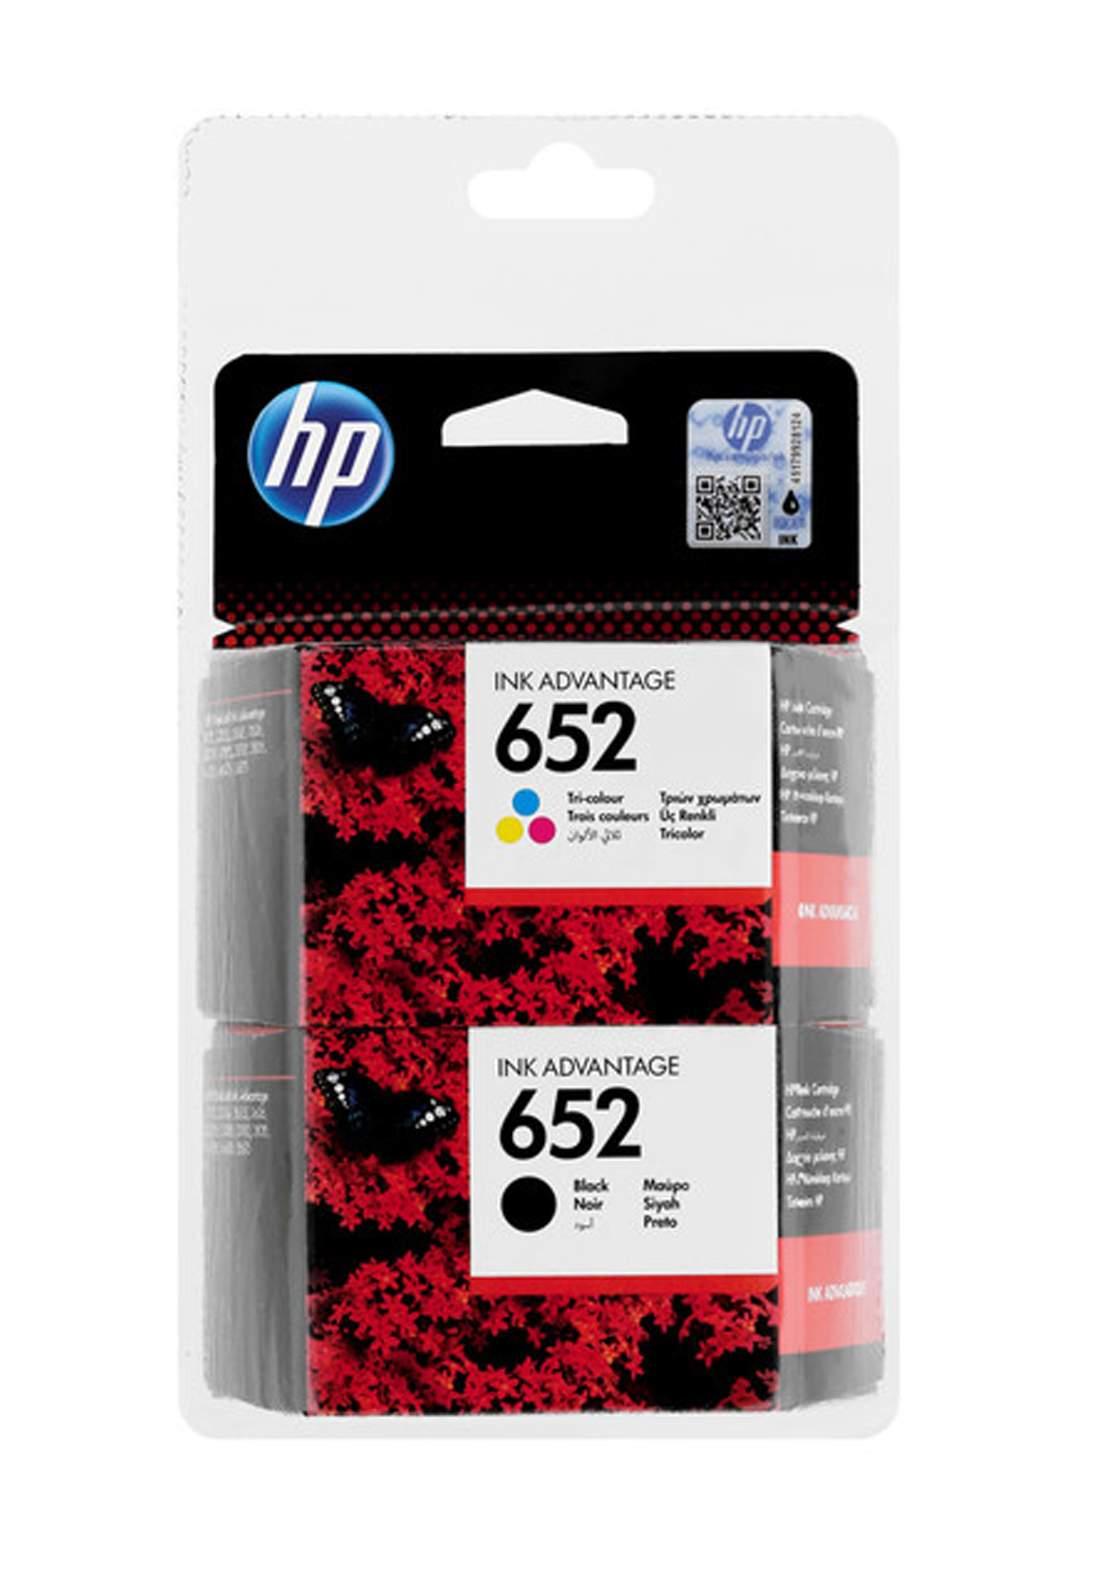 HP 652 Ink Cartridges Combo Pack  مجموعة خراطيش حبر